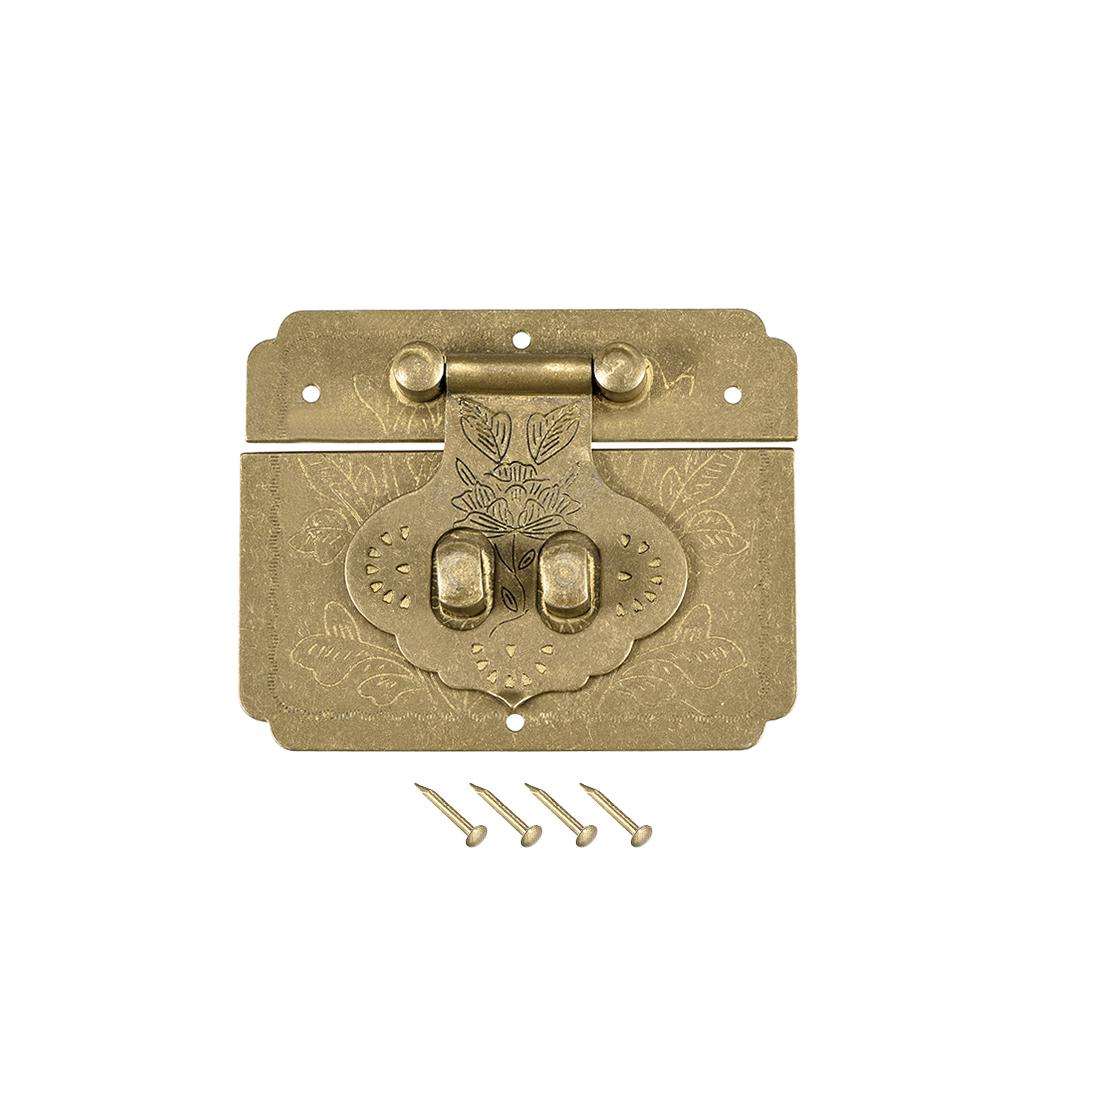 Wood Case Box Rectangle Hasp 65x52mm Closure Brass Antique Latches Bronze Tone